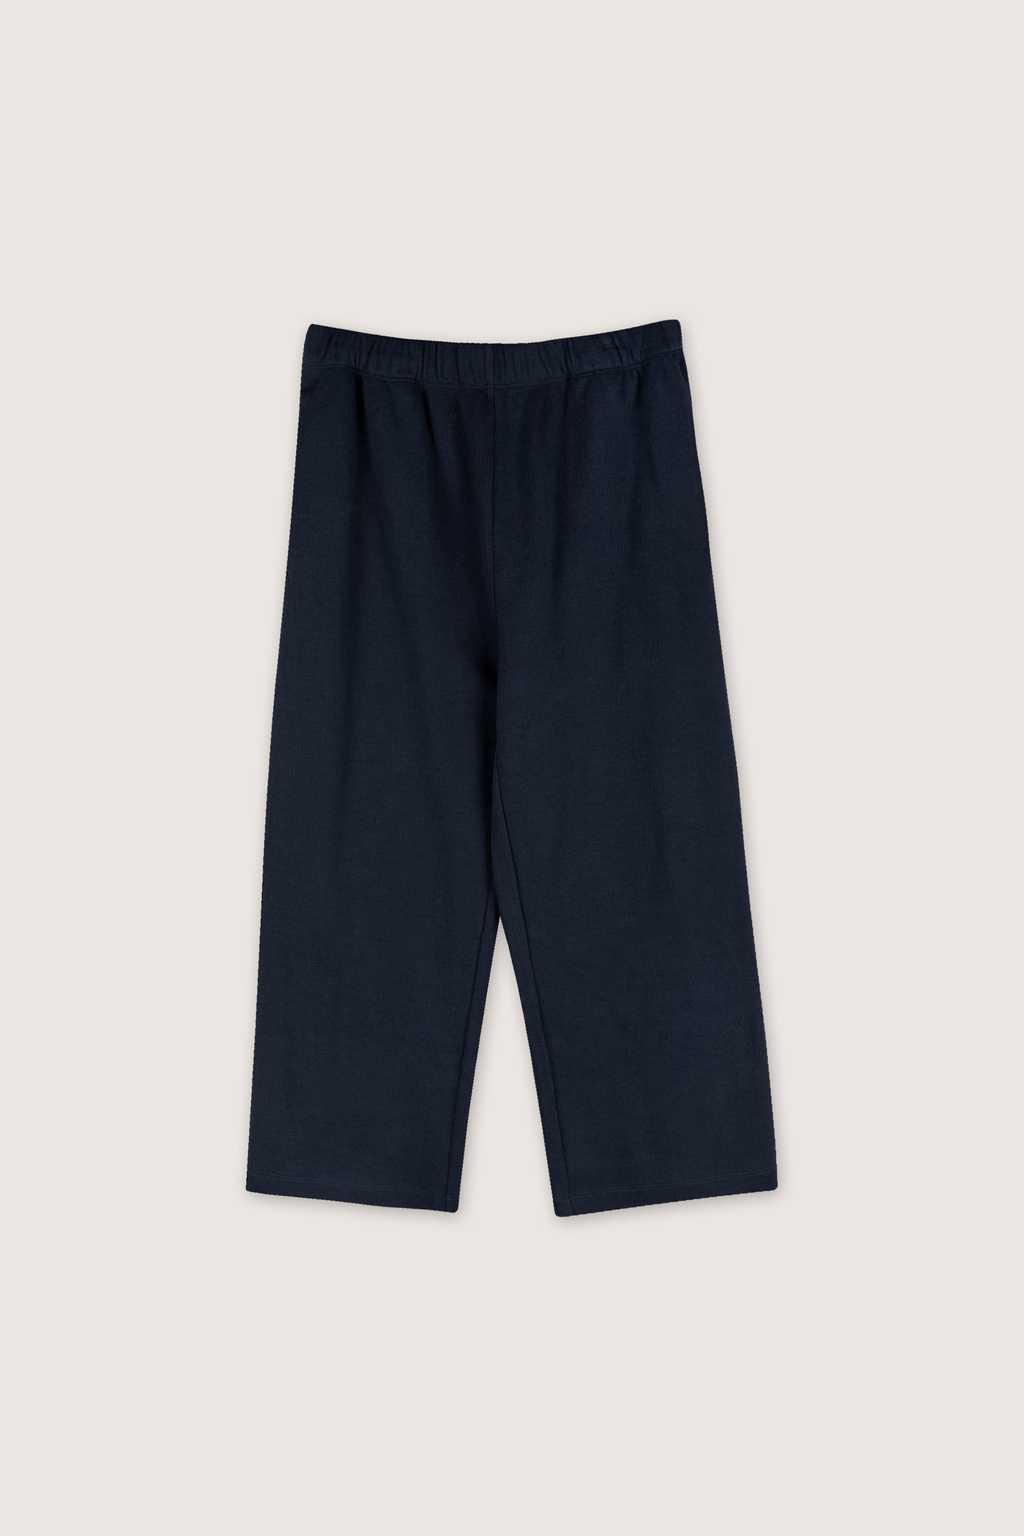 Pant 1937 Blue 9